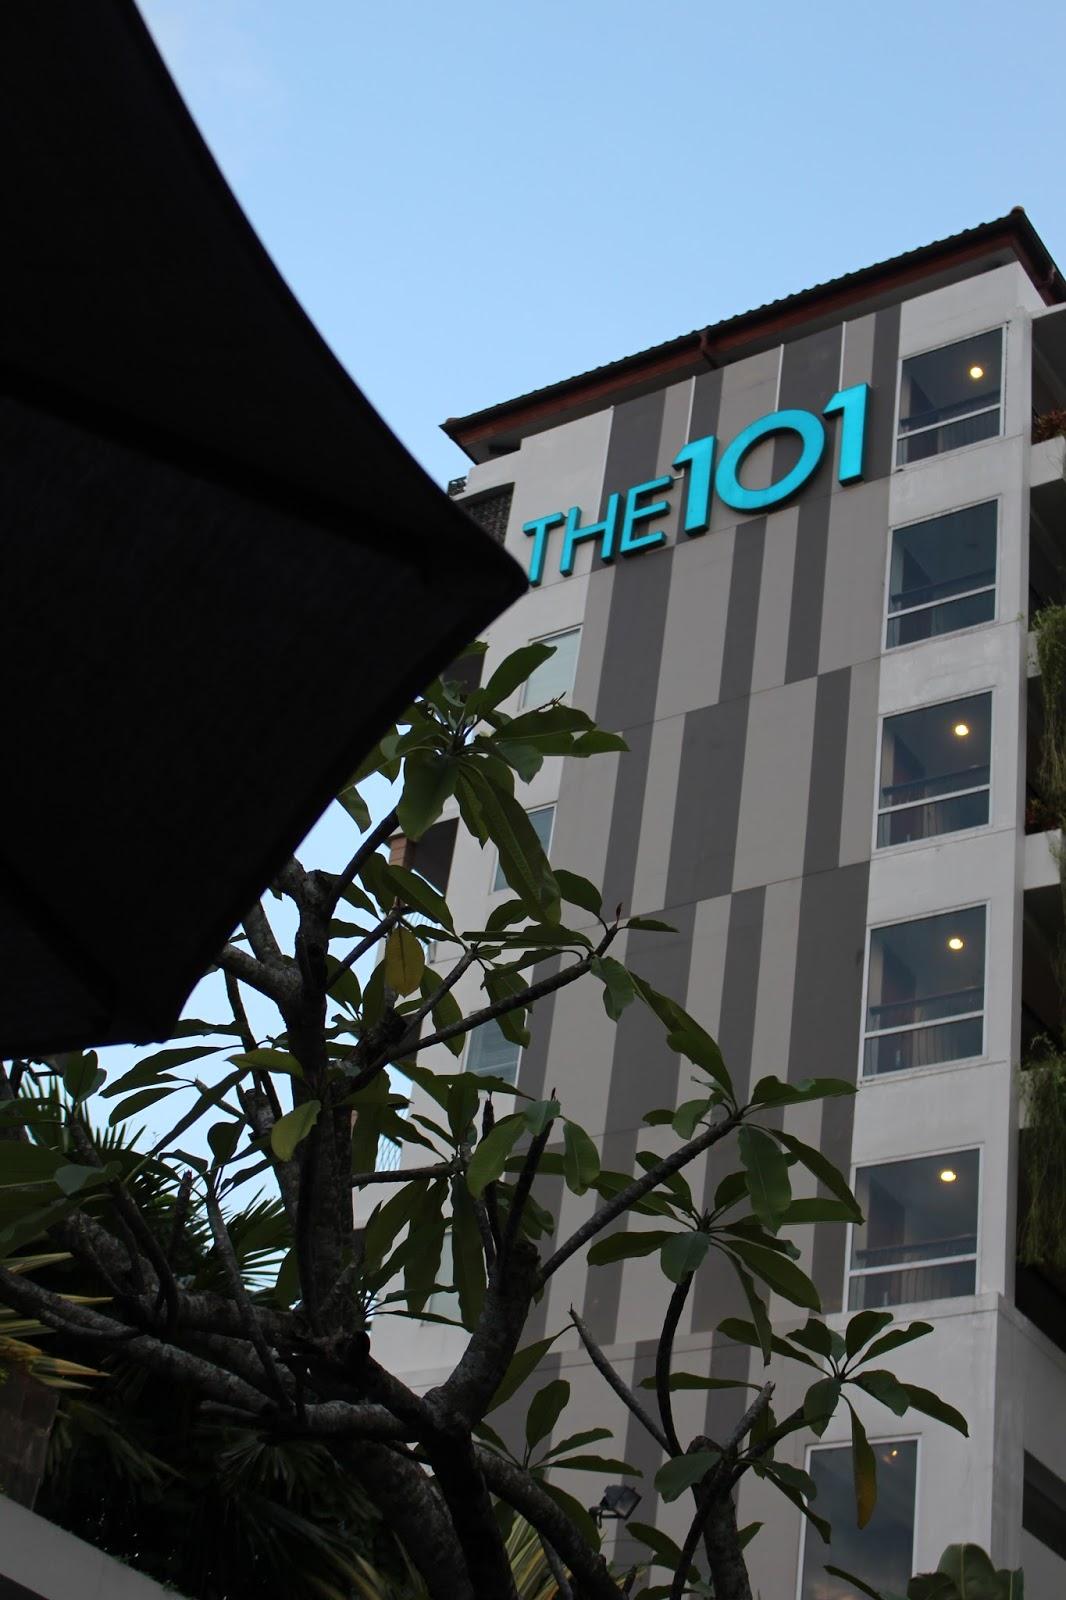 The 101 Hotel Jogjakarta